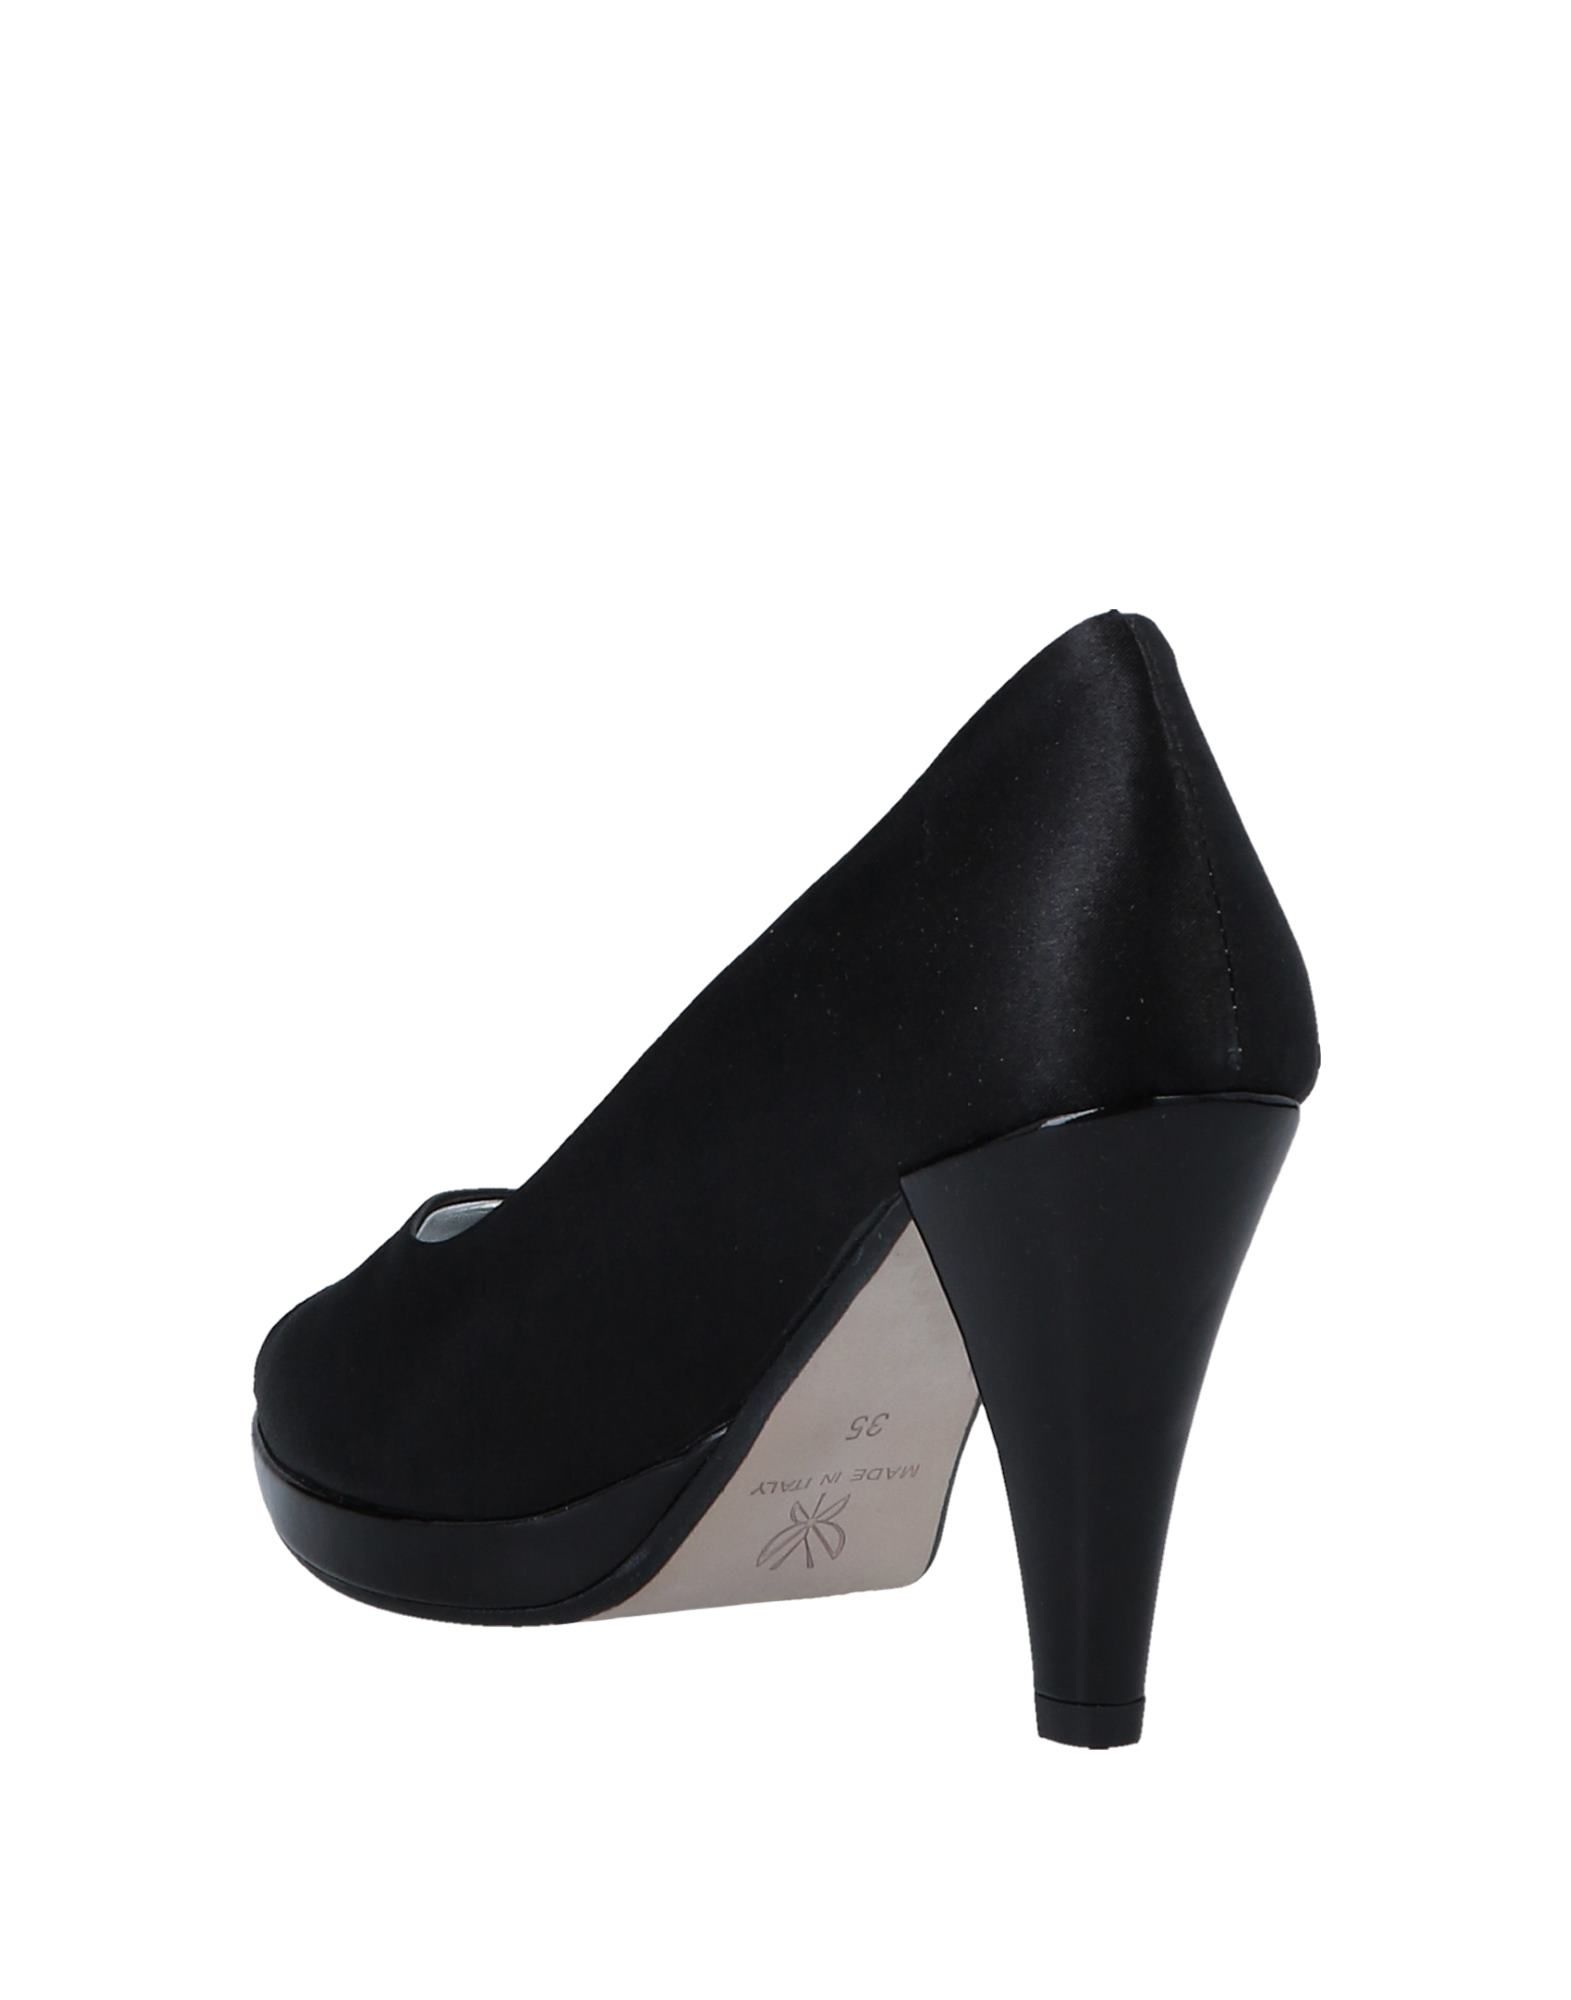 Le Coquet Pumps Damen Gute 11547831GR Gute Damen Qualität beliebte Schuhe 674c64